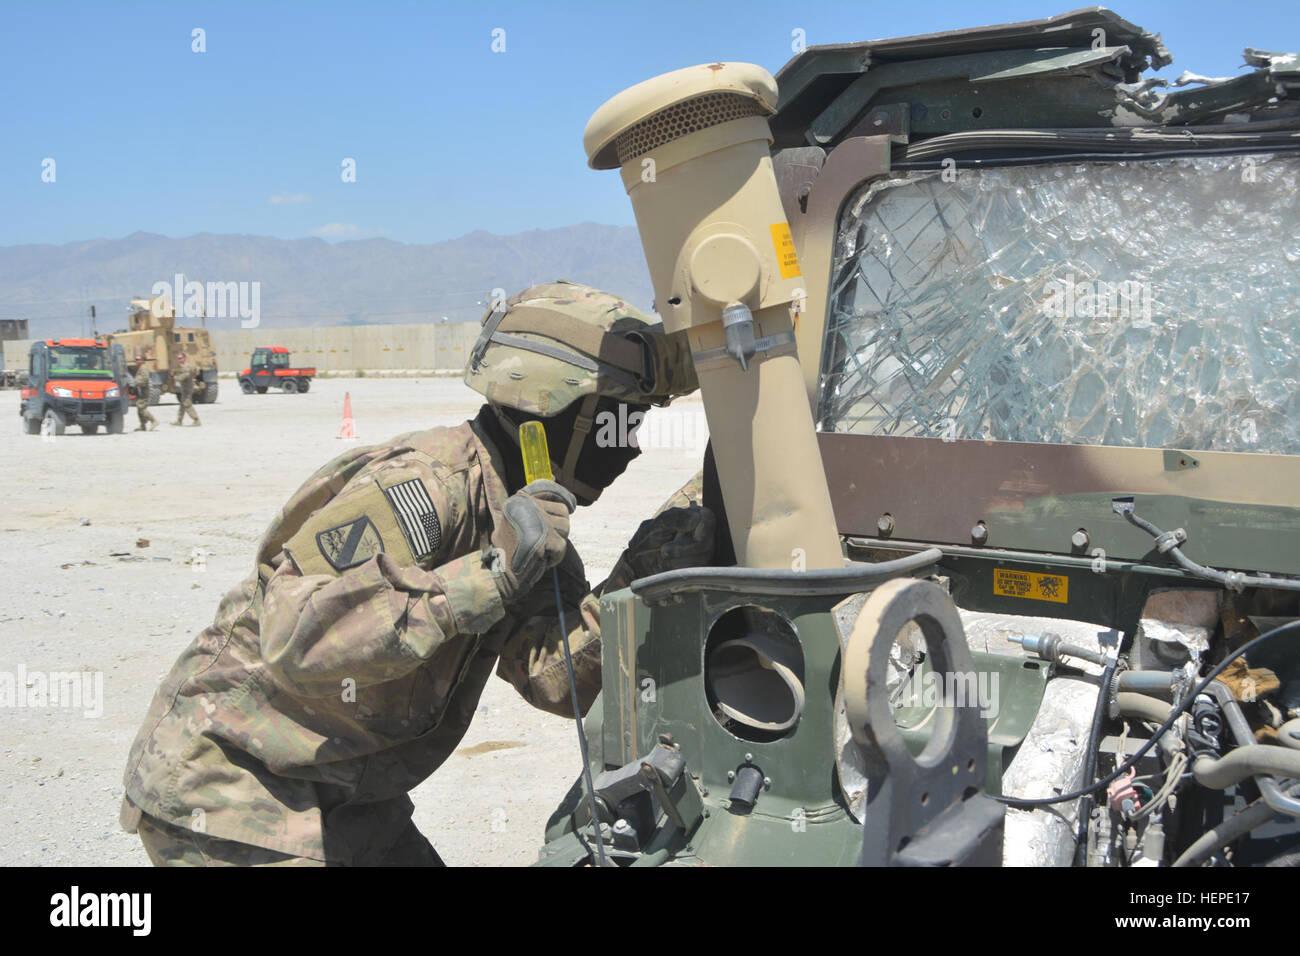 Spc Ramir Baysa 802nd Ordnance Company A U S Army Reserve Unit Stock Photo Alamy